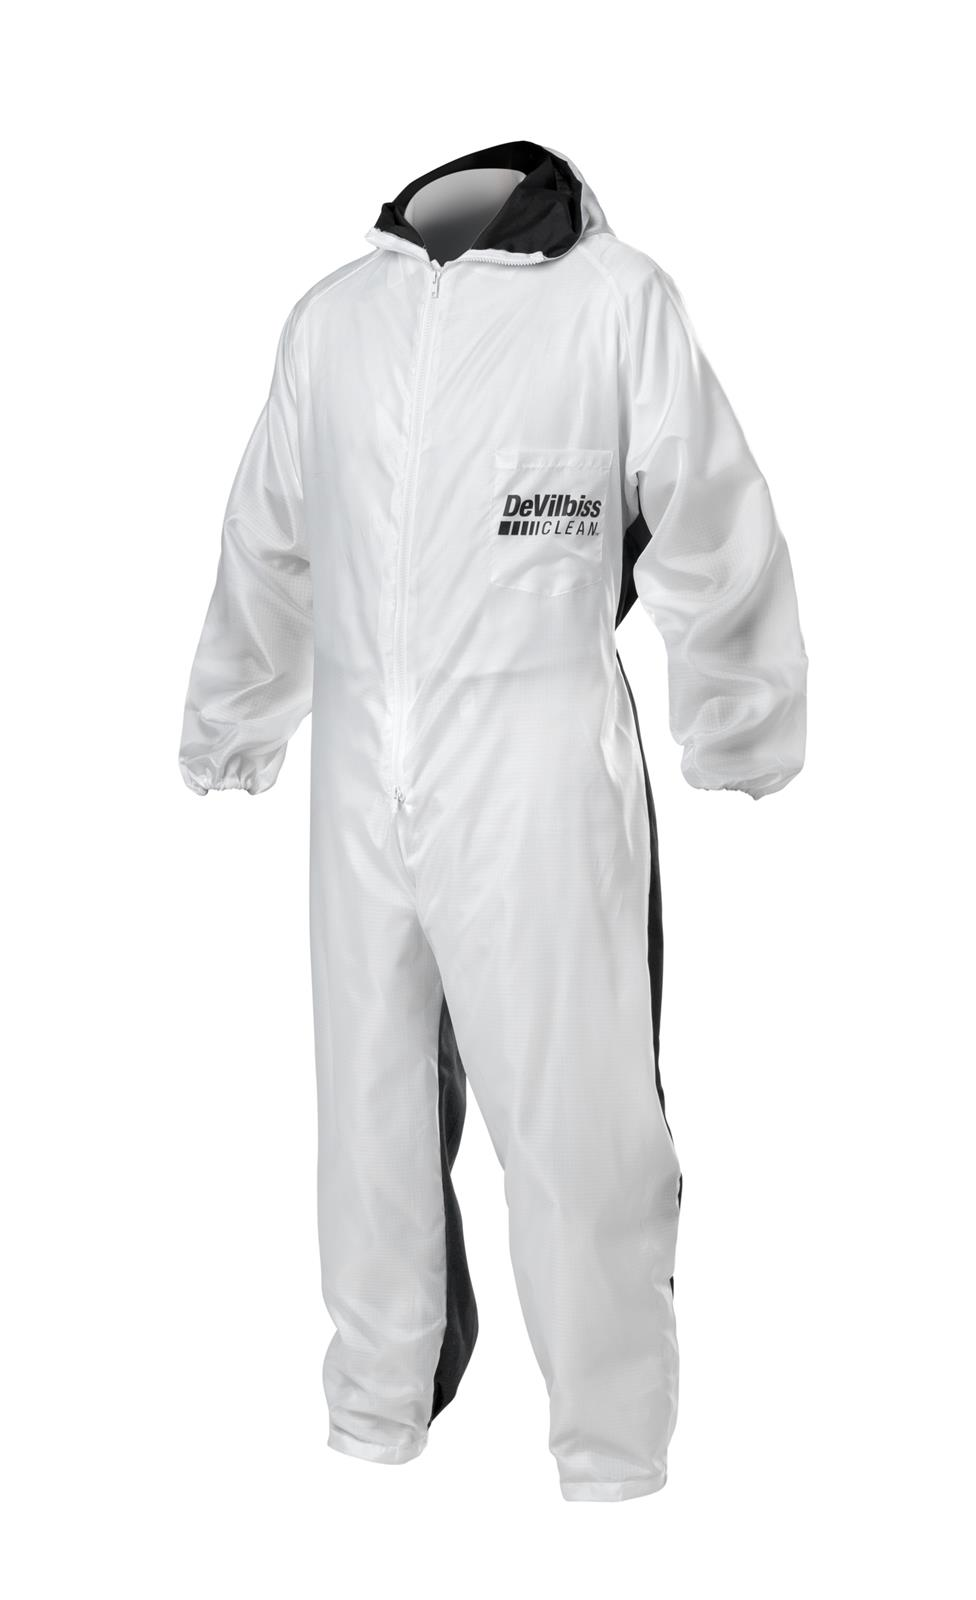 Large DeVilbiss DEV-803665 Reusable Lab Coat with Pullover Hood